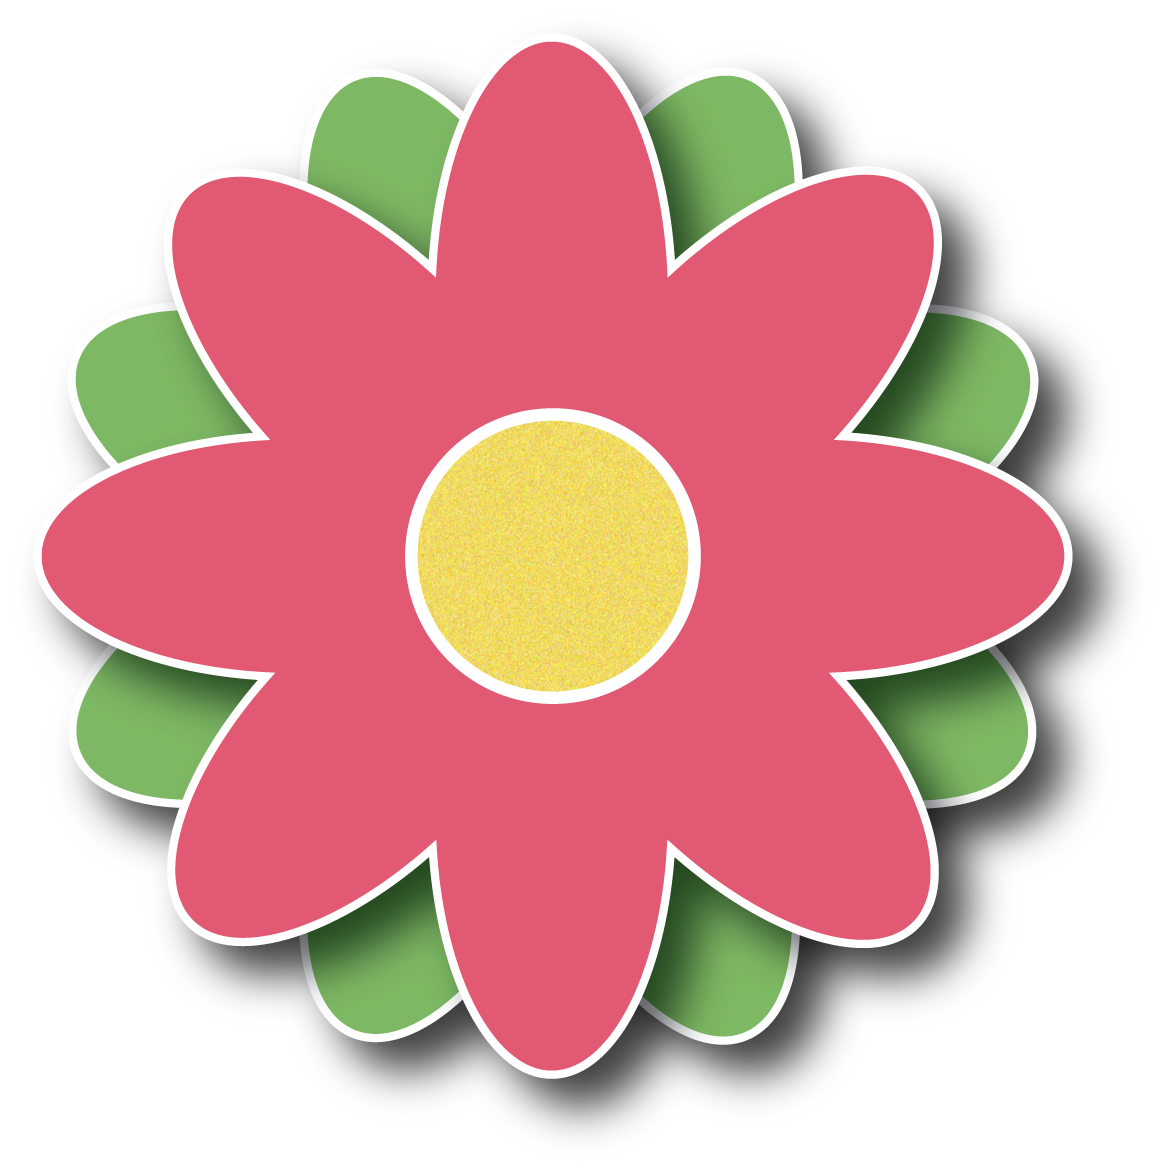 free spring clipart mtleeajta png 1165 1171 summer clipart [ 1165 x 1171 Pixel ]